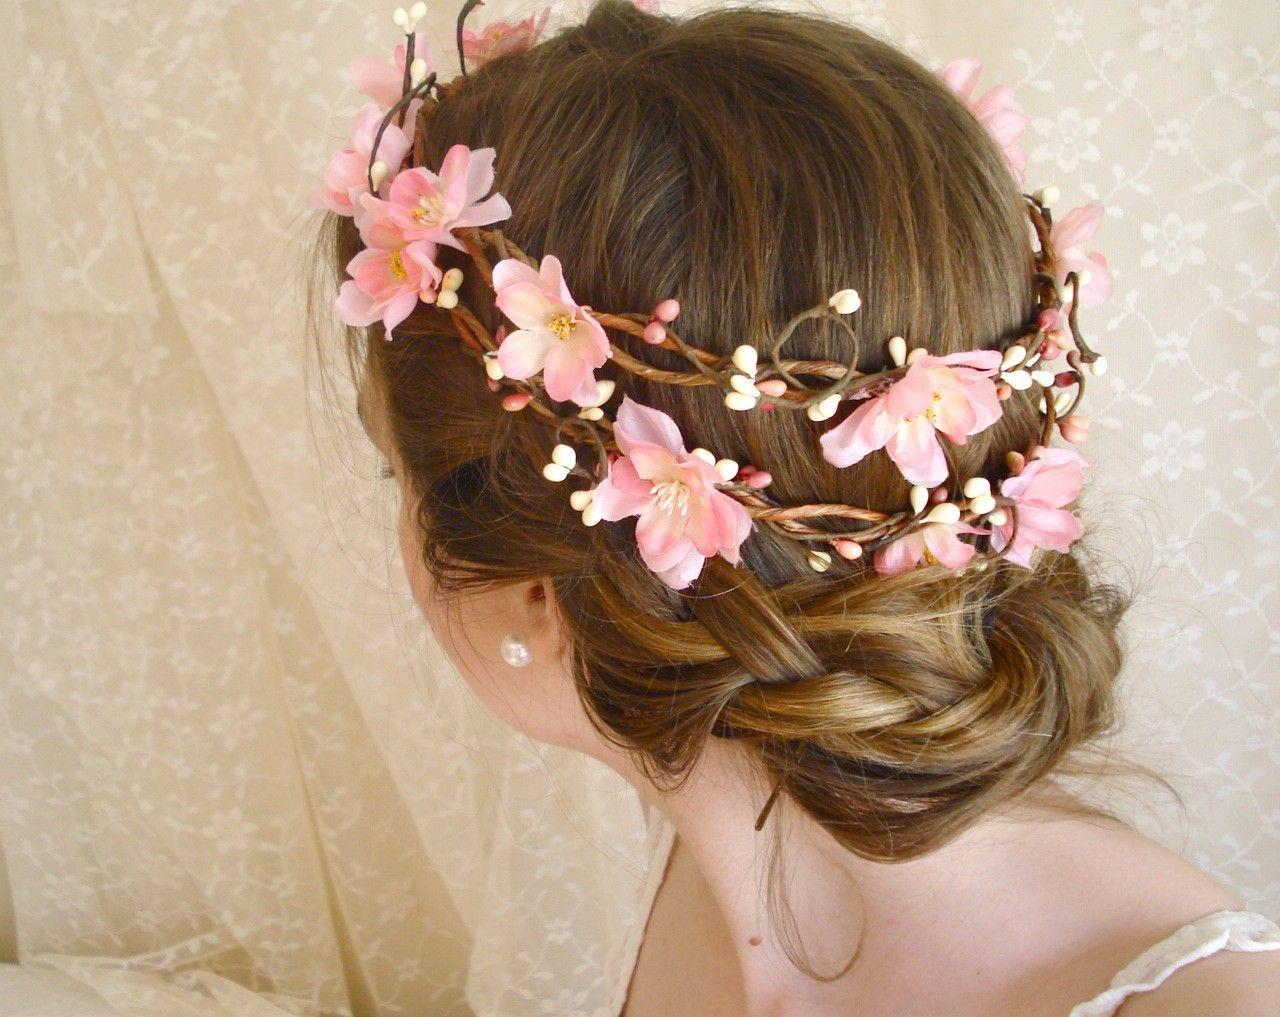 Floral Wedding Garland Head Cherry Blossom Flower Head Wreath Sakura Dreams A Pink Bridal Flower Wreath Hair Flower Head Wreaths Pink Bridal Crown